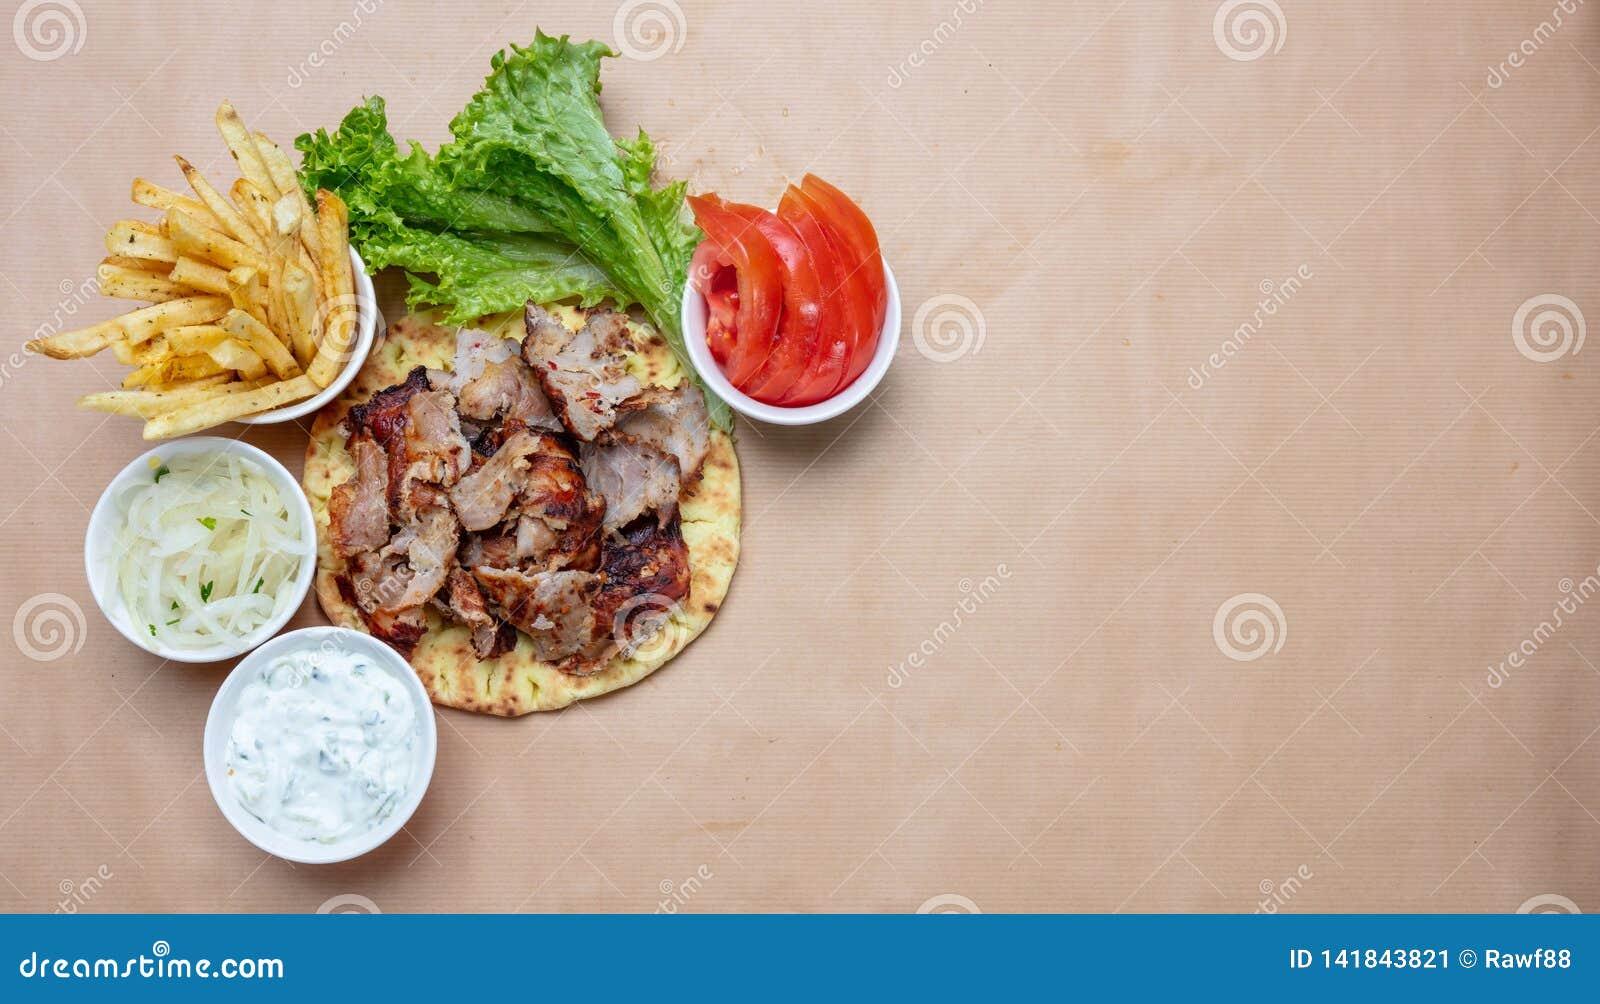 Shawarma, γυροσκόπια στο ψωμί pita, λαχανικά και σάλτσα tzatziki, τοπ άποψη Παραδοσιακά τουρκικά, ελληνικά τρόφιμα κρέατος